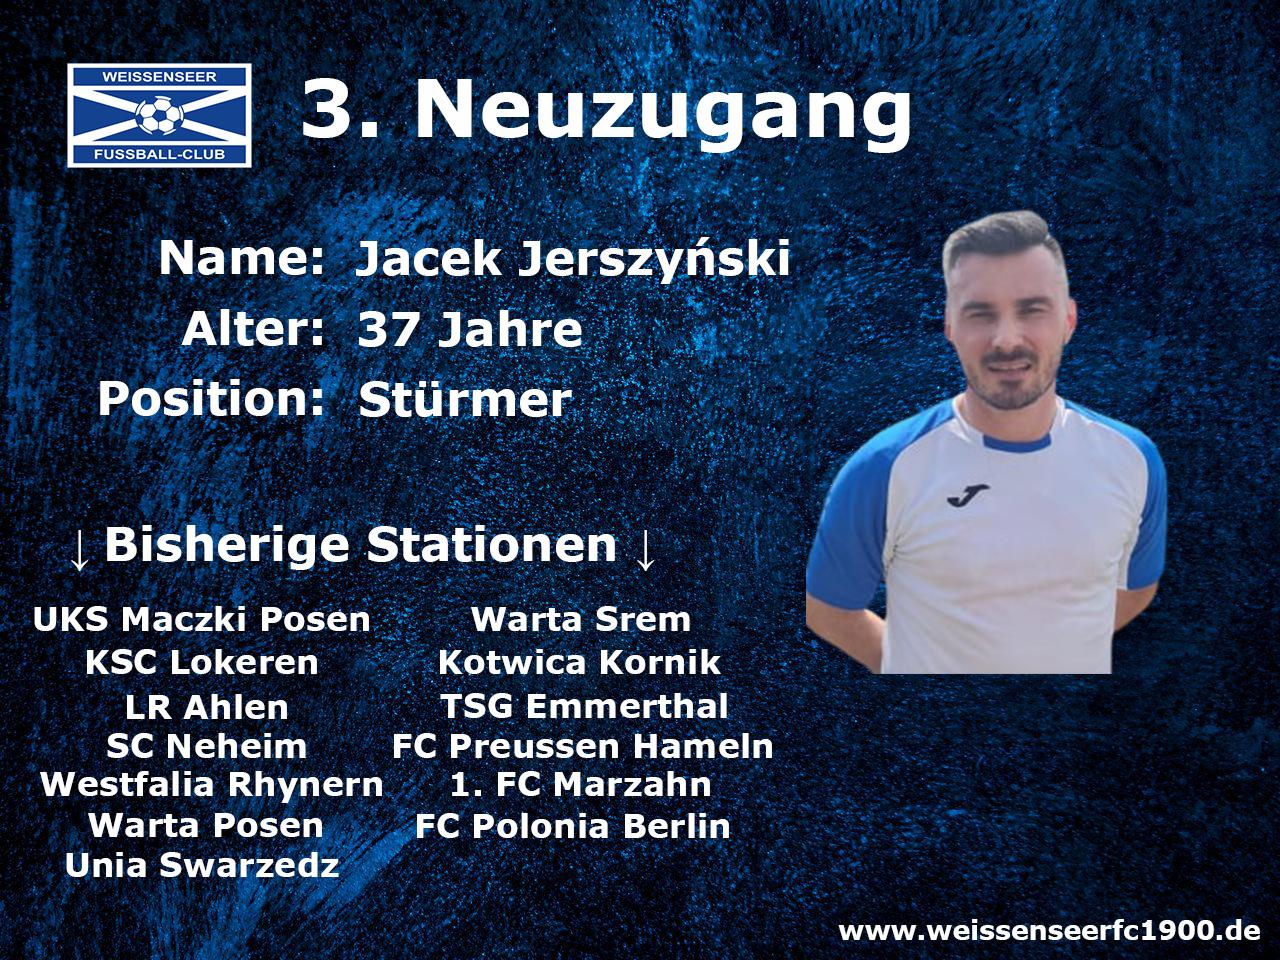 3. Neuzugang für das Landesliga-Team